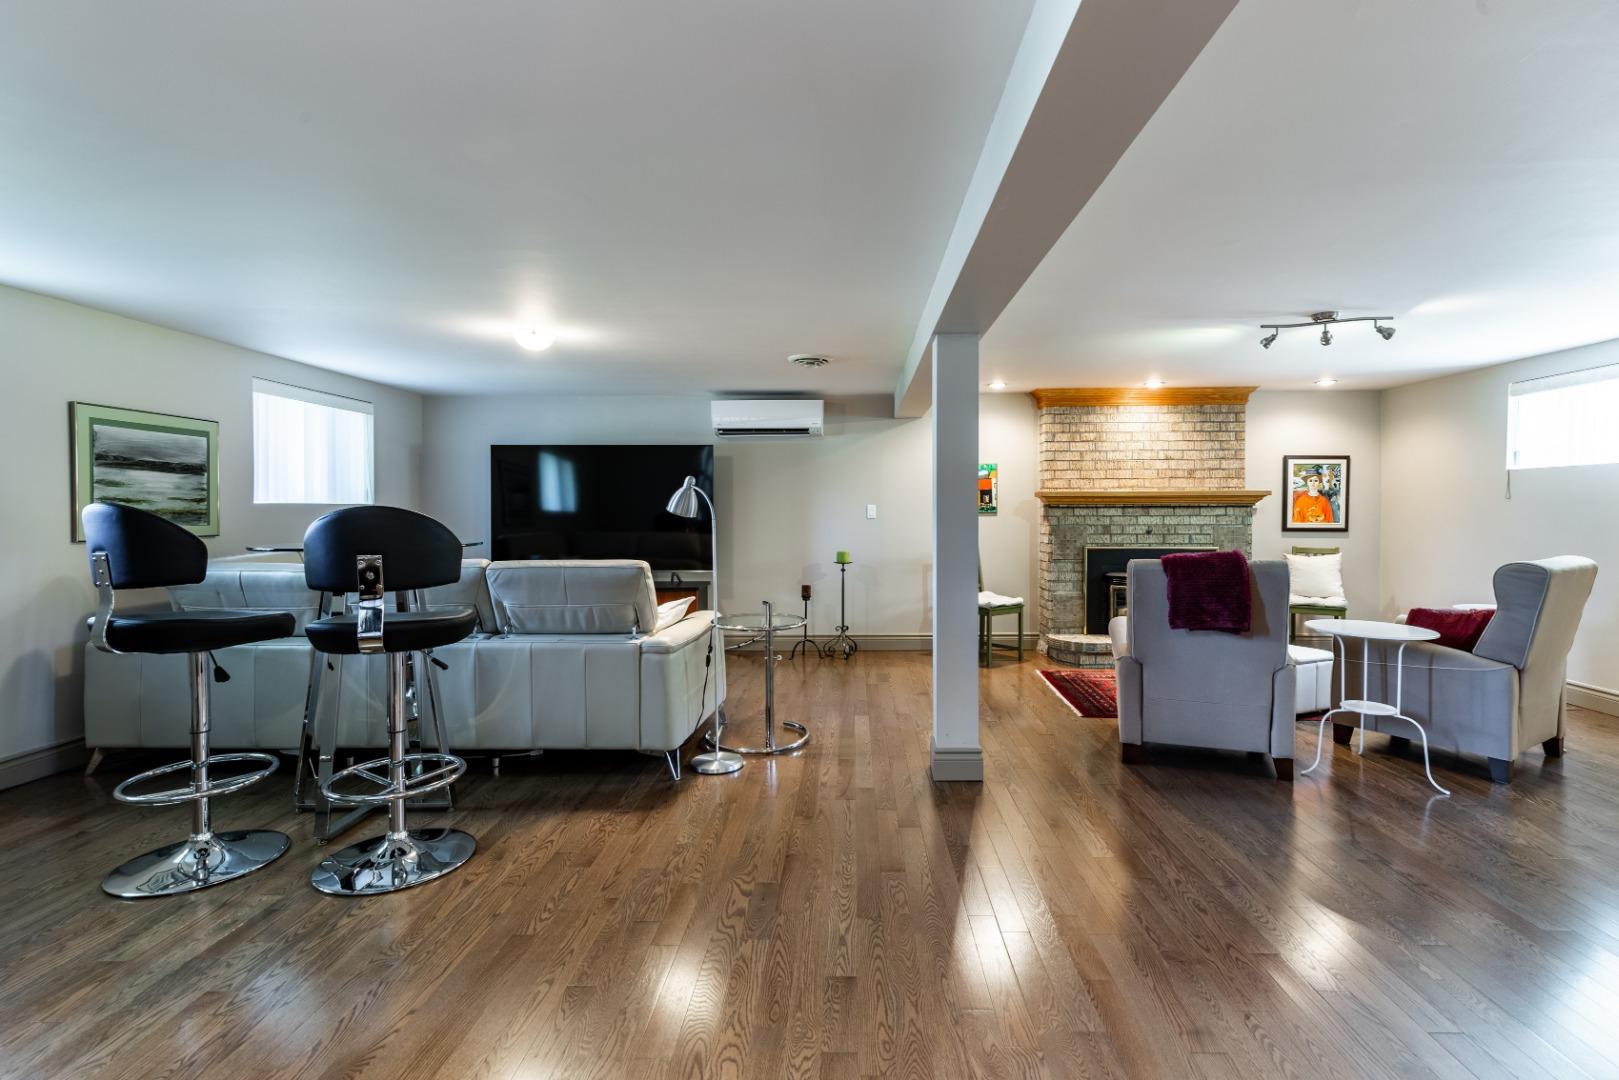 Maison à vendre St-Bruno - 517, rue Carmel